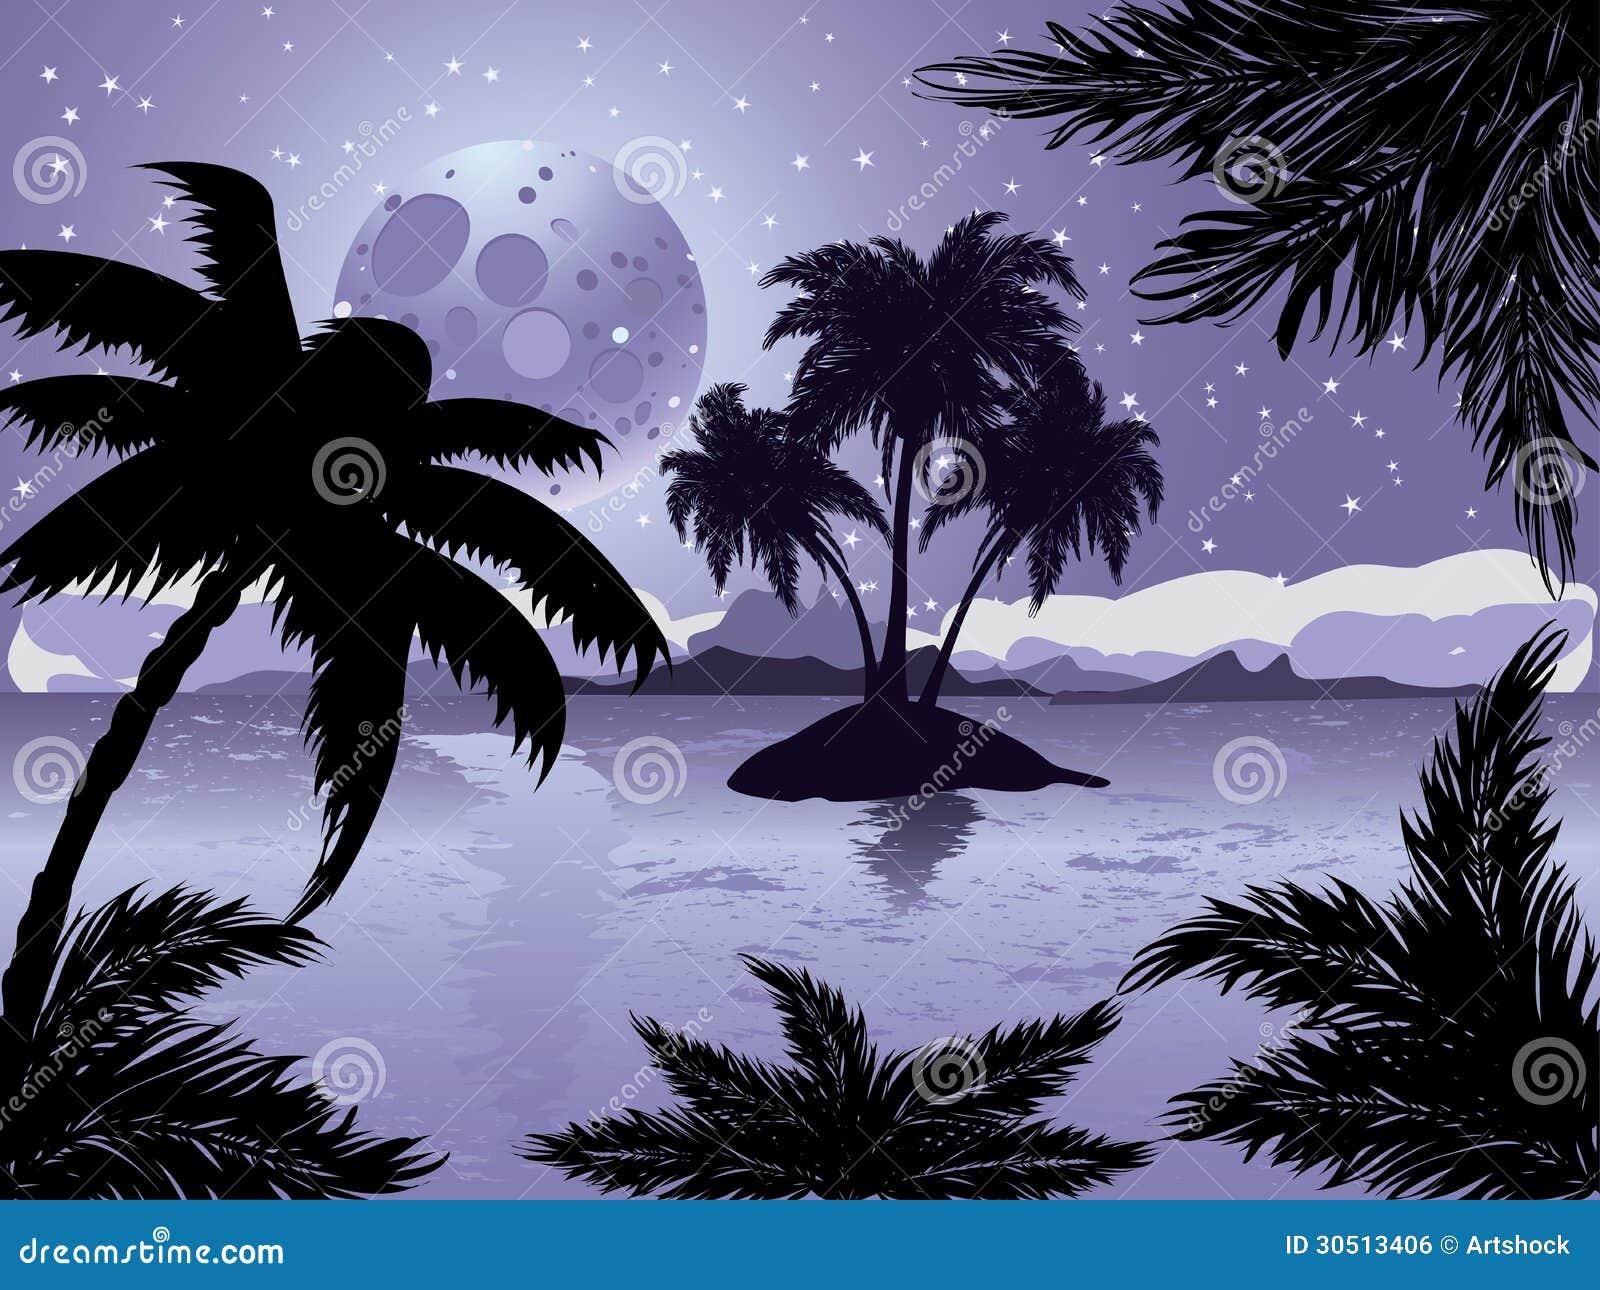 Tropical Island Beach Ambience Sound: Night Tropic Island Royalty Free Stock Image